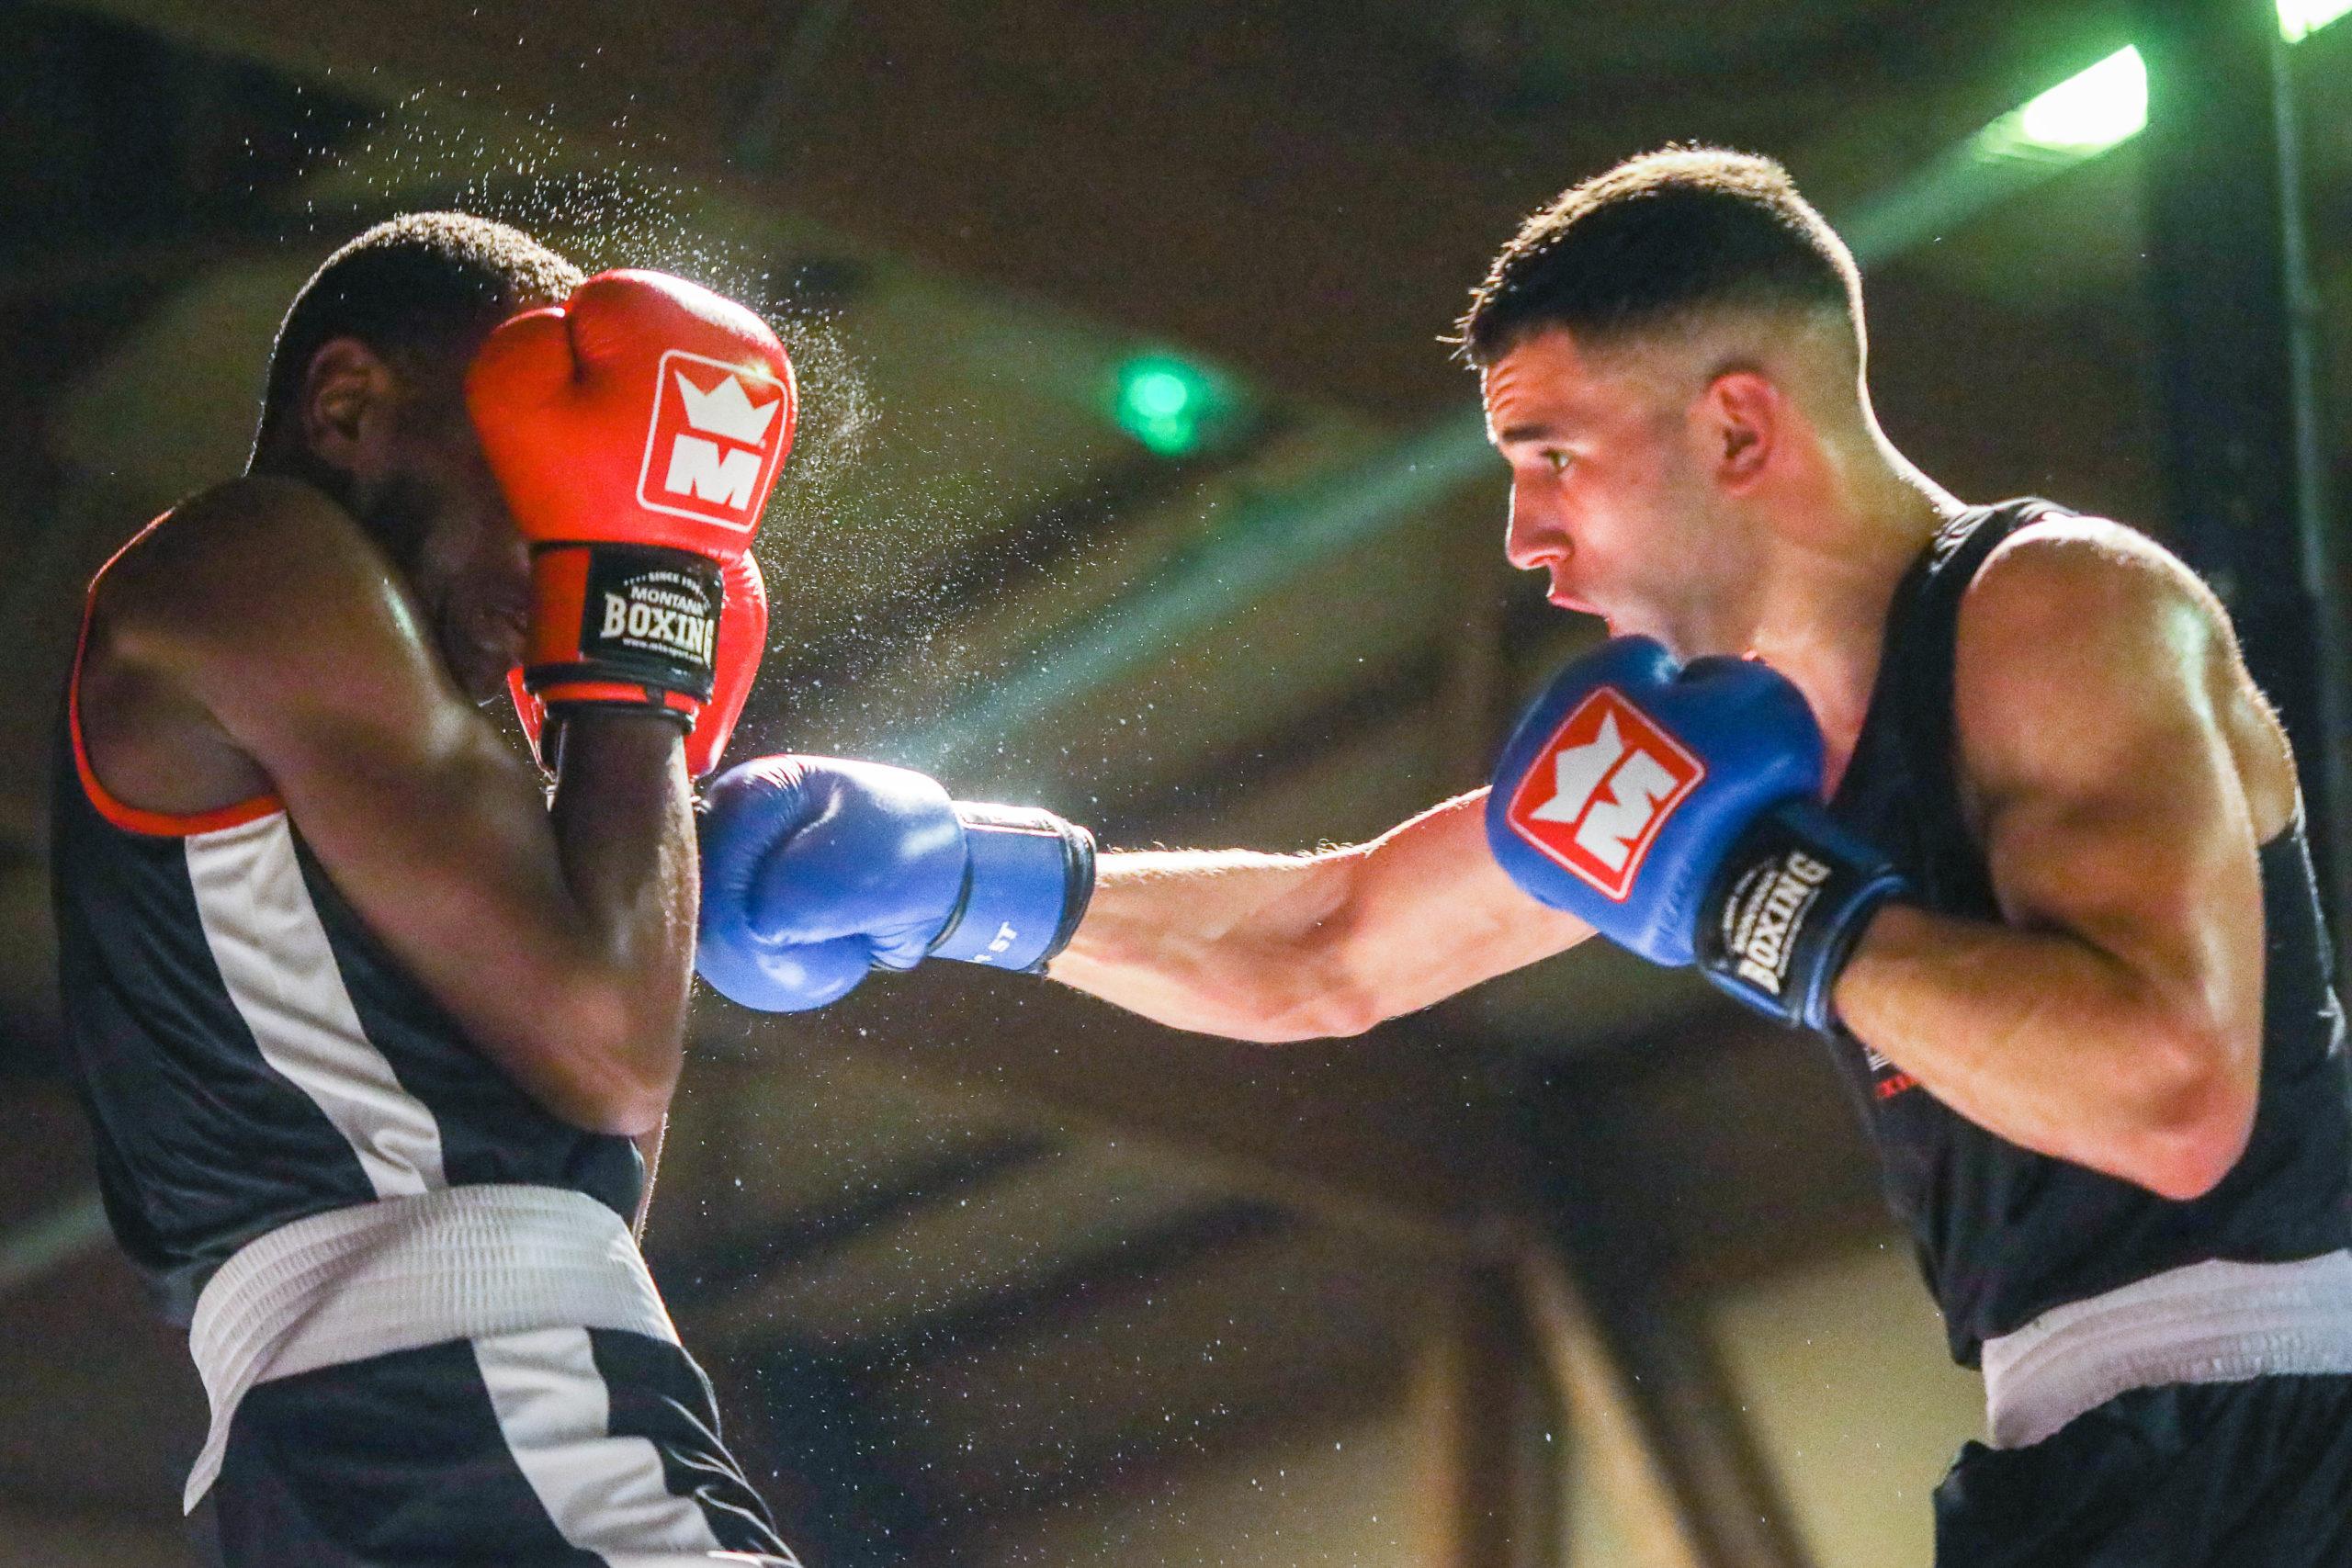 Nabil Bouazni Amiens Boxing Club Photos Roland Sauval 0007